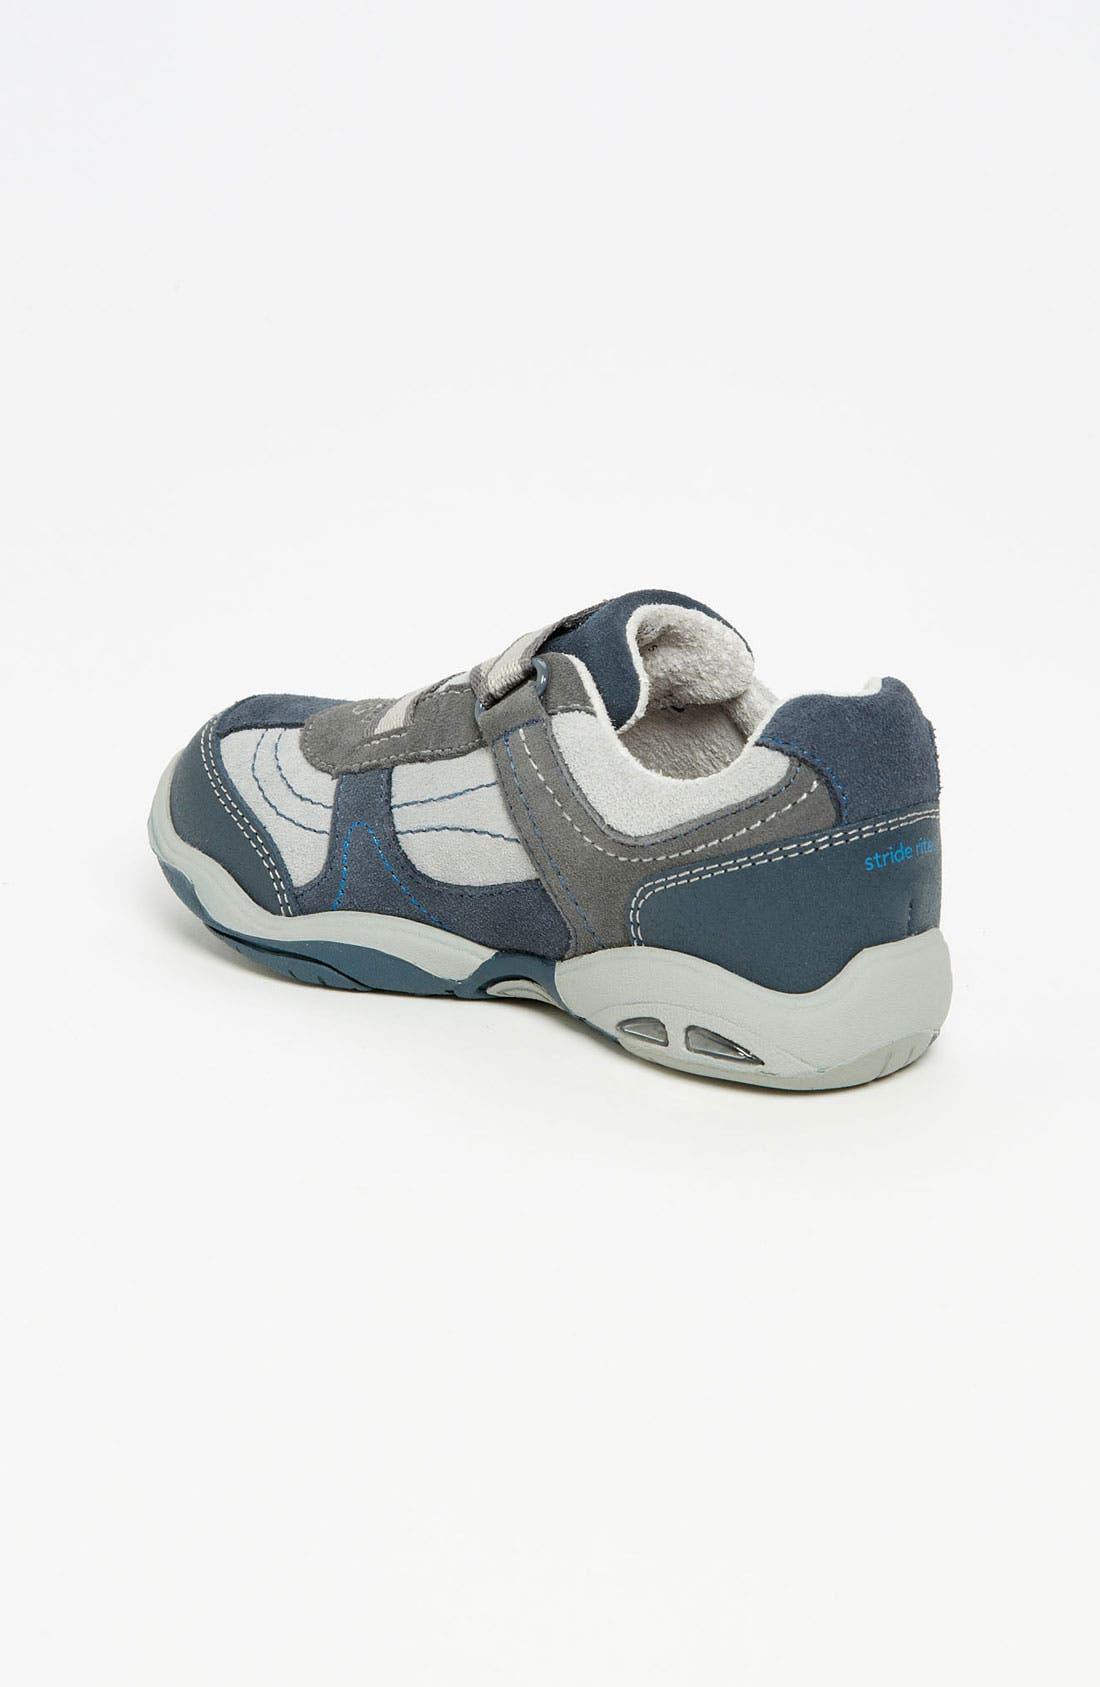 Alternate Image 2  - Stride Rite 'Chad' Sneaker (Toddler & Little Kid)